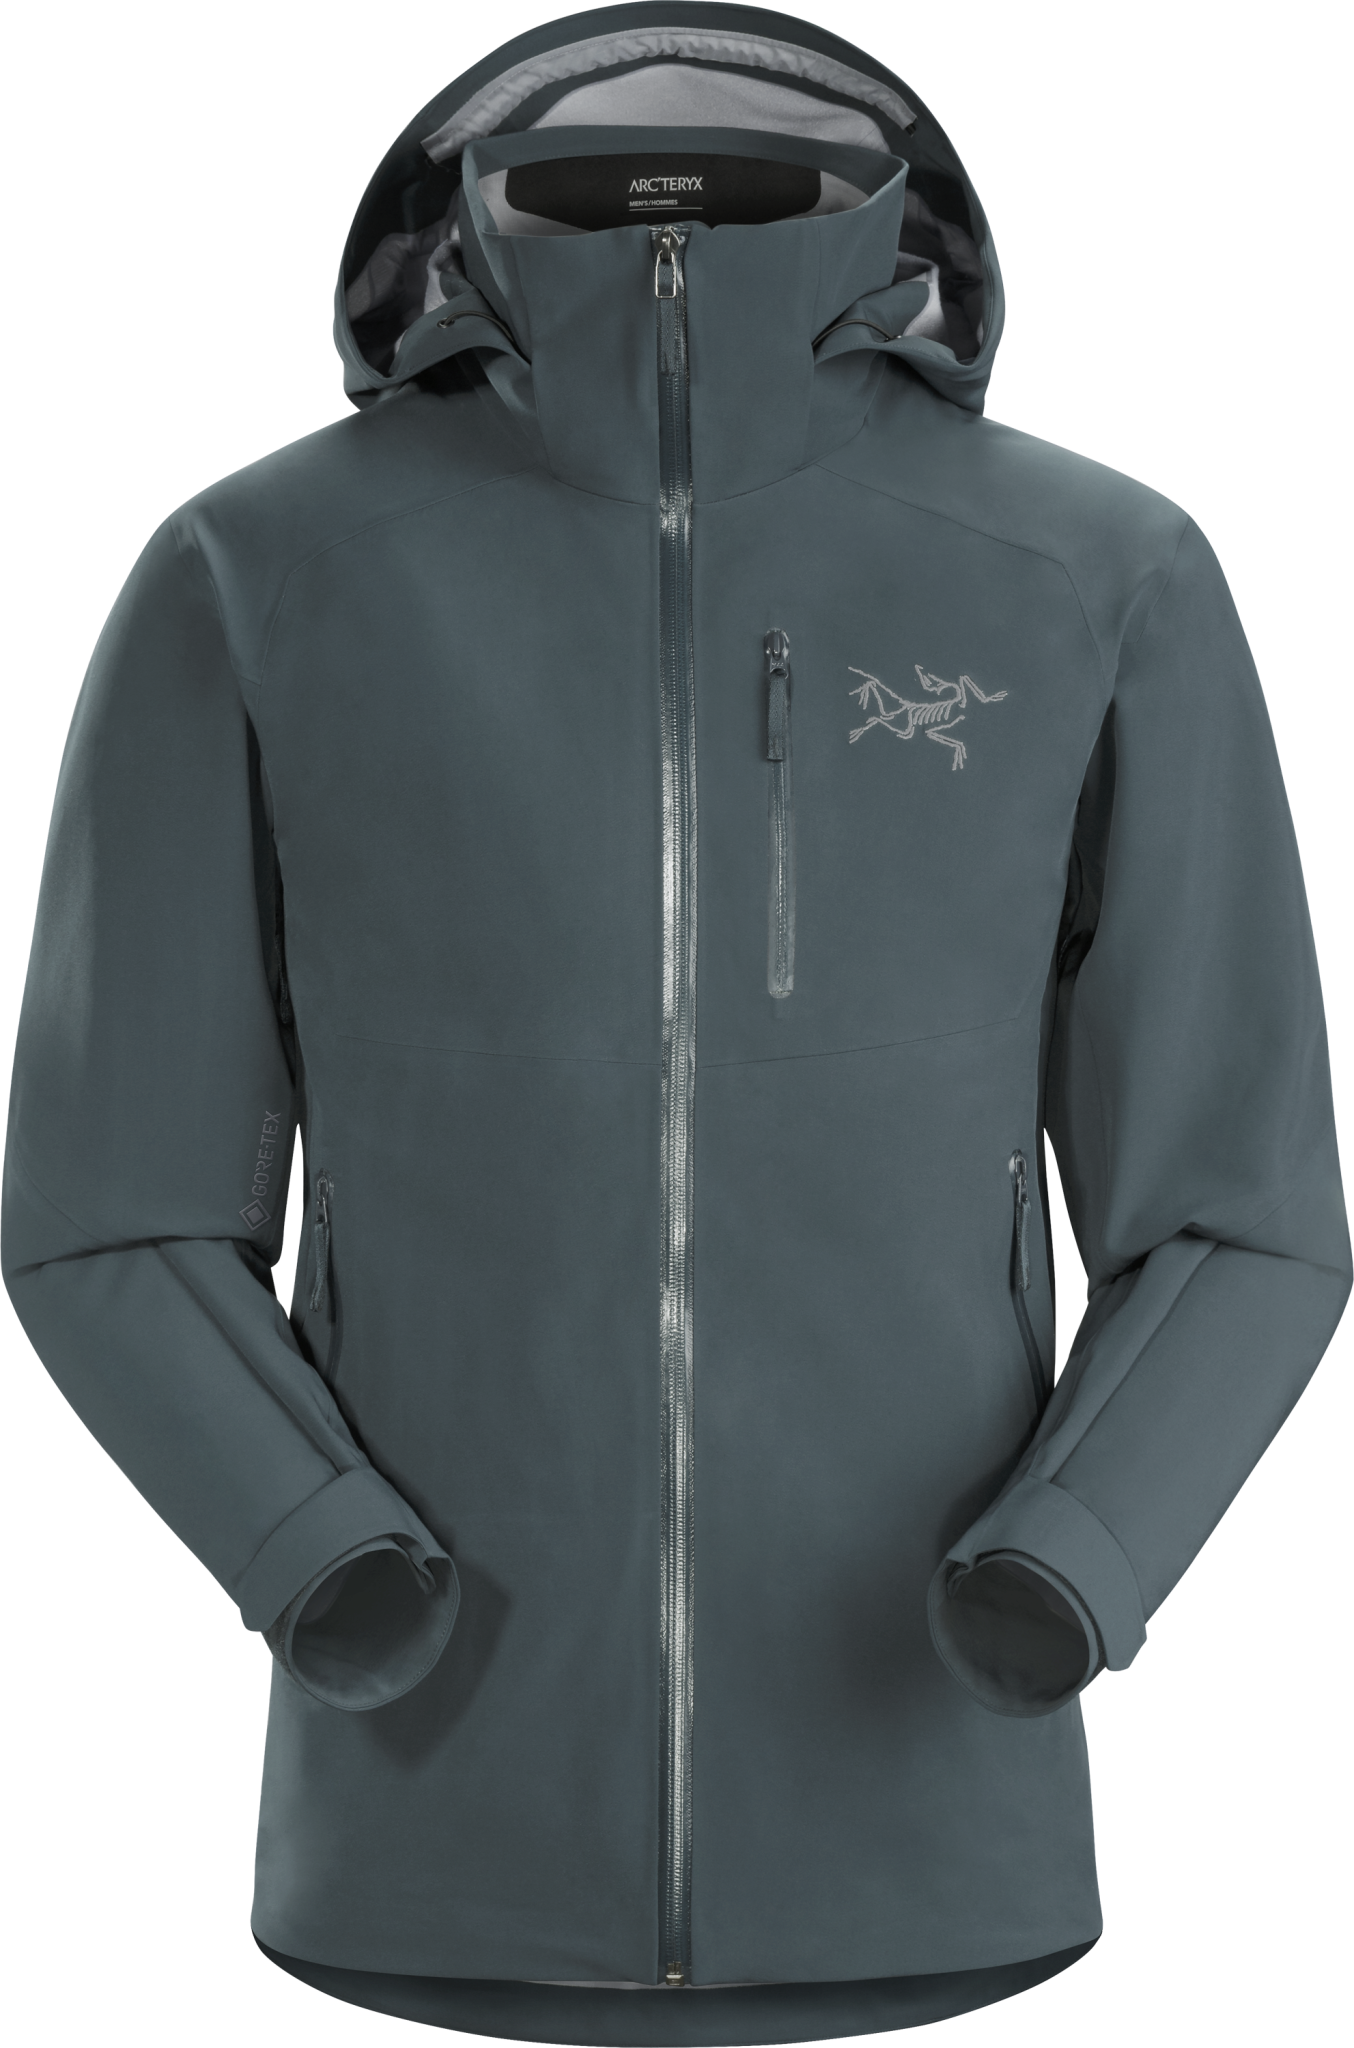 Arc'teryx Cassiar Jacket Men's-1